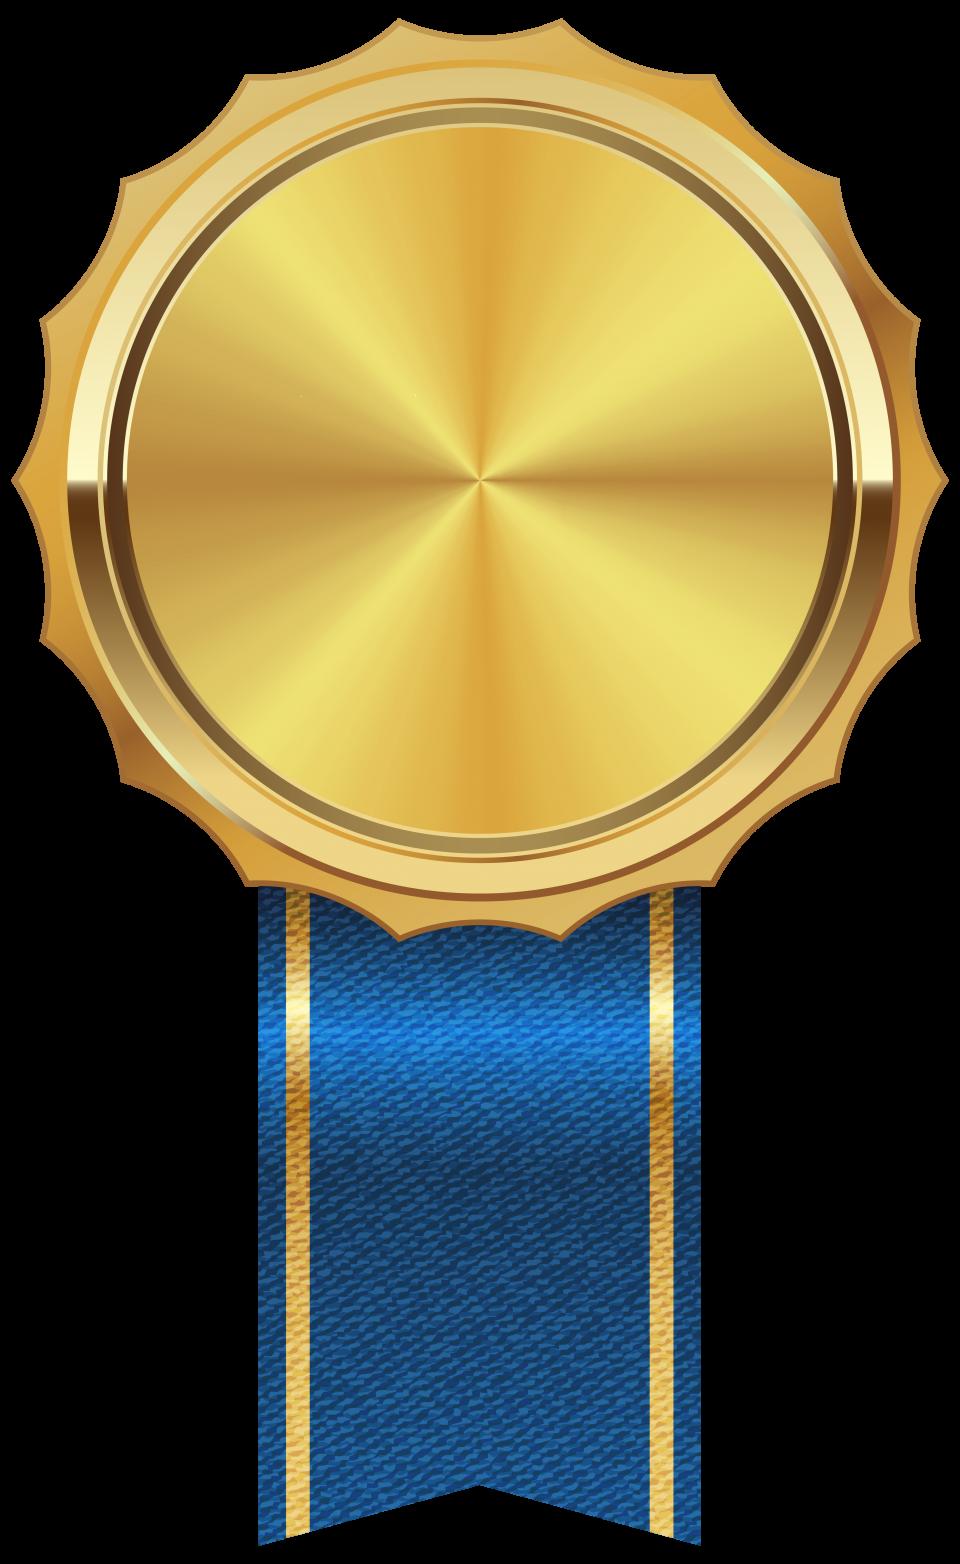 Gold Medal Png Image Bingkai Bingkai Foto Desain Grafis